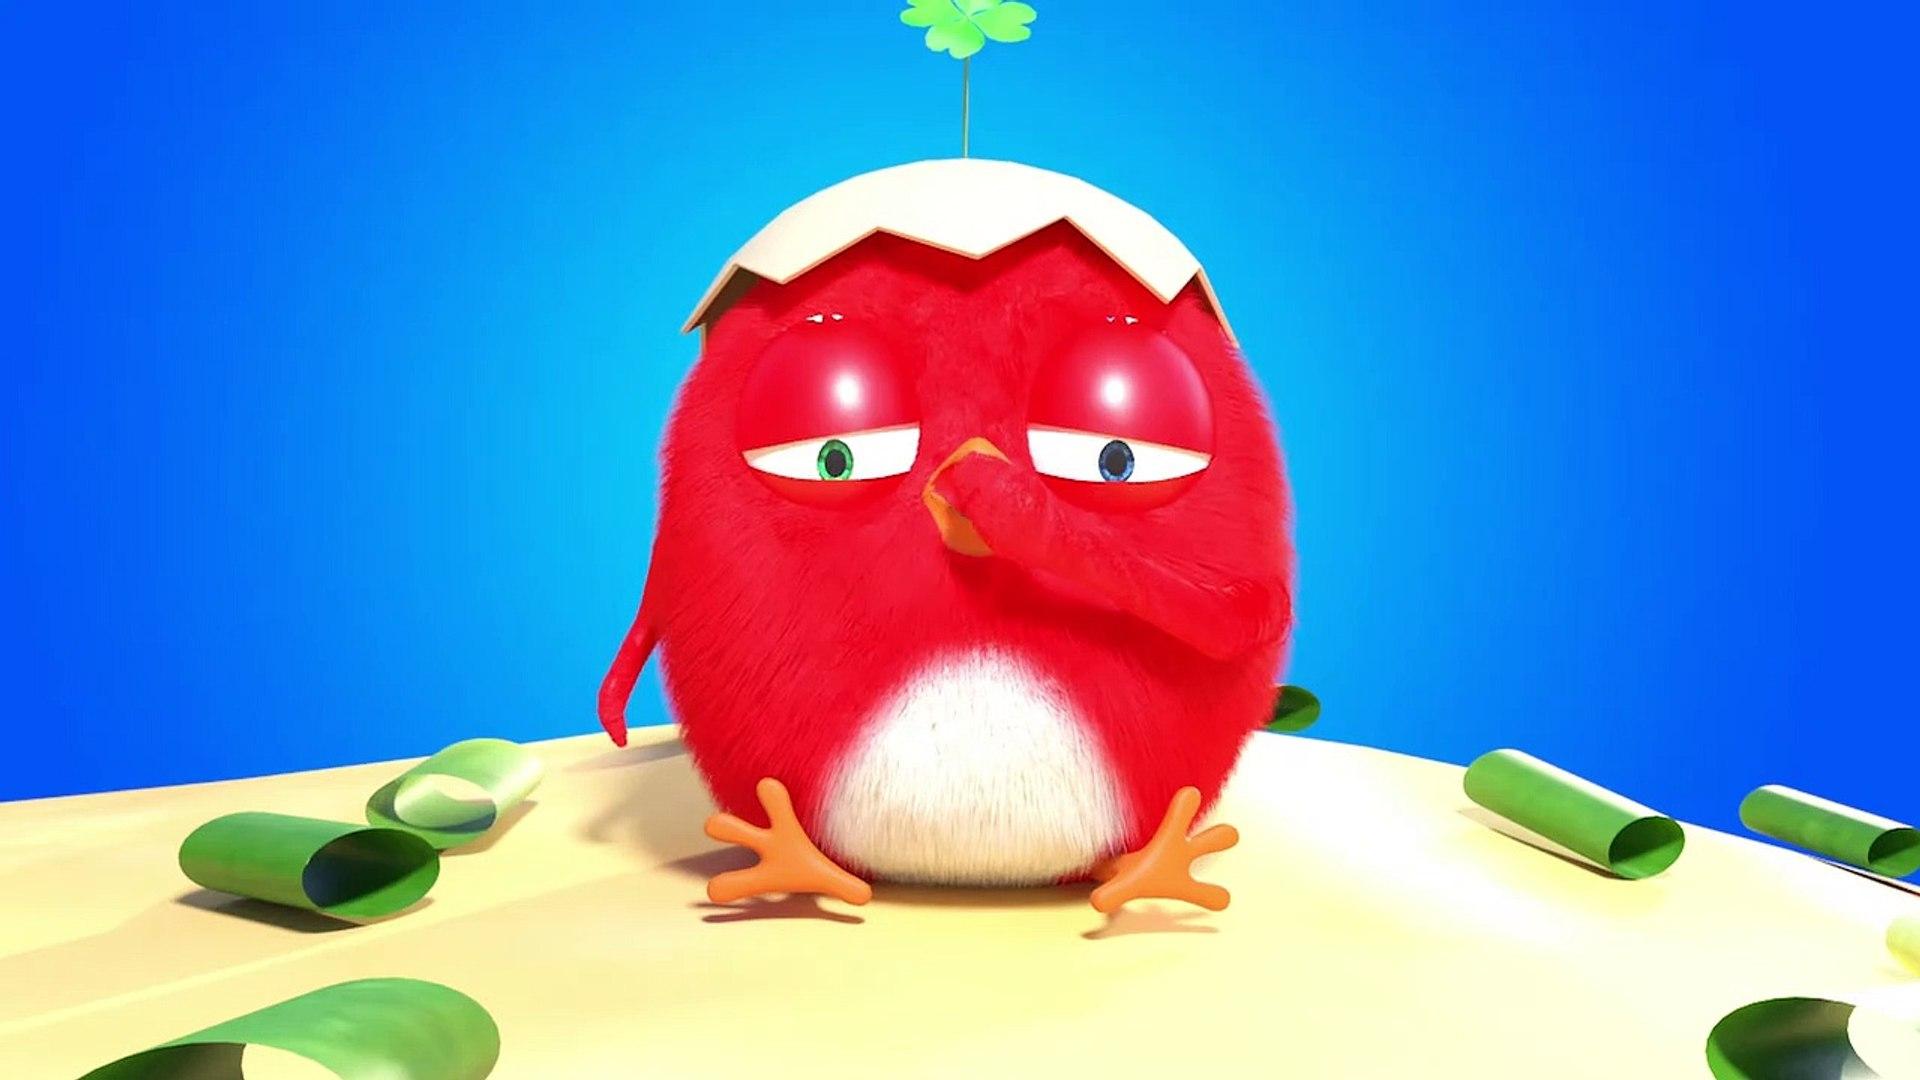 CucKoo Cartoon  Cuckoo Chicken 2020 - Part 8 Drôle de bande dessinée pour les enfants 2020